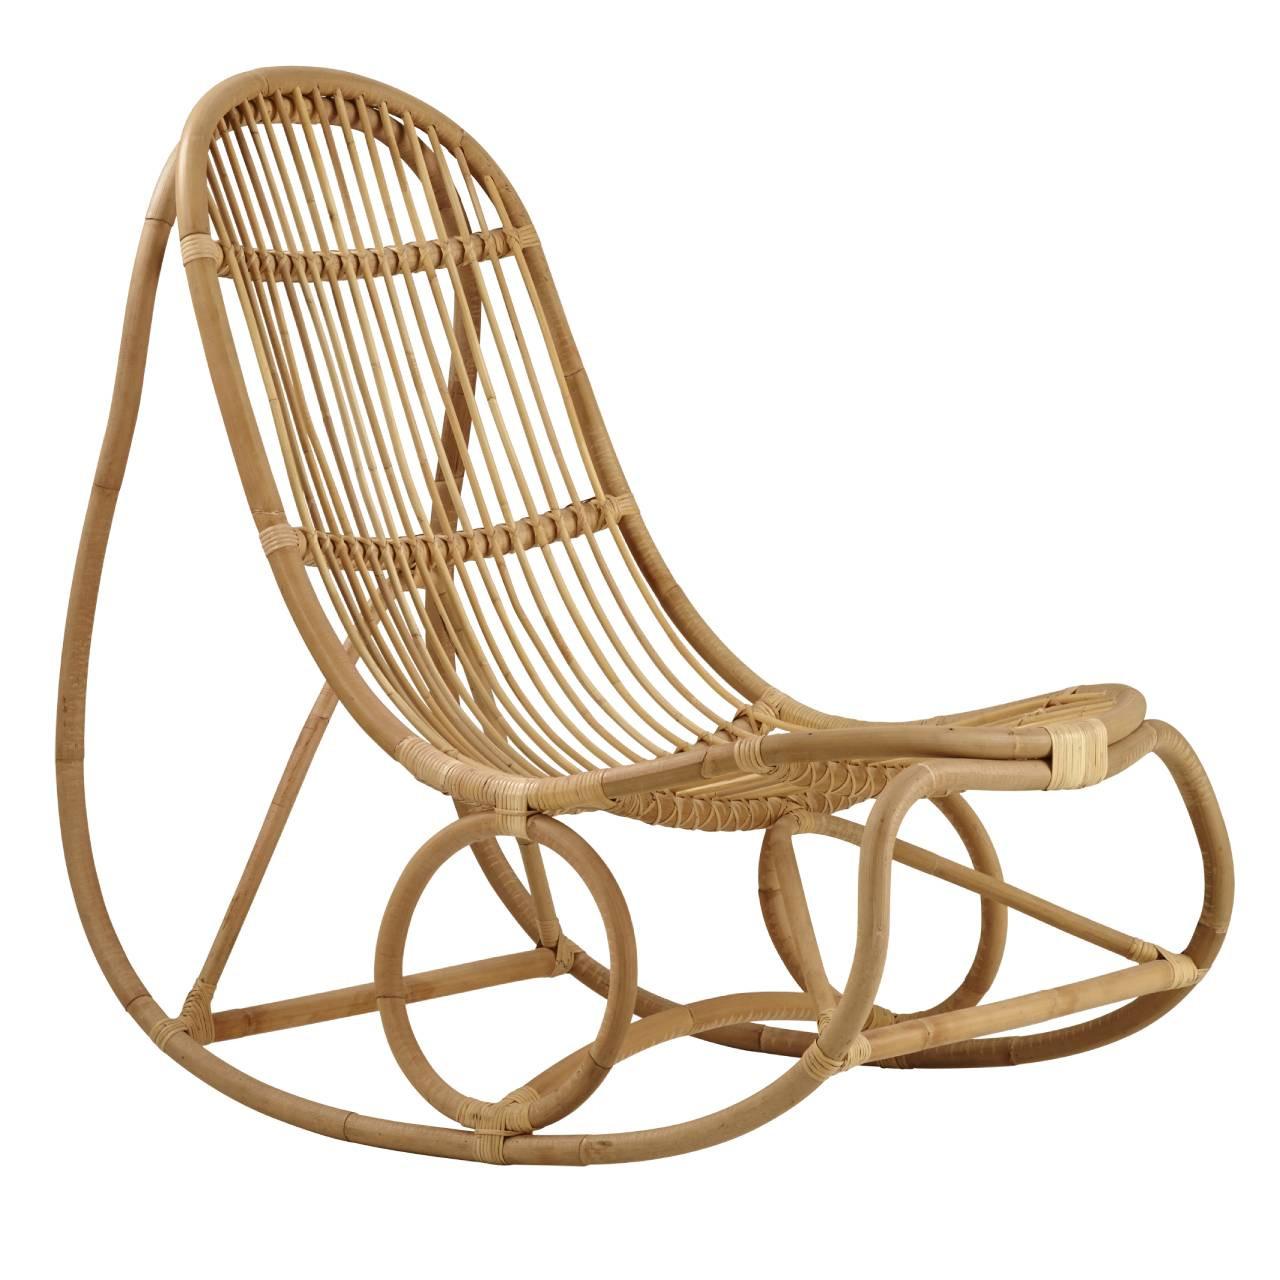 Sensational Nanna Ditzel Nanny Rocking Chair Unemploymentrelief Wooden Chair Designs For Living Room Unemploymentrelieforg